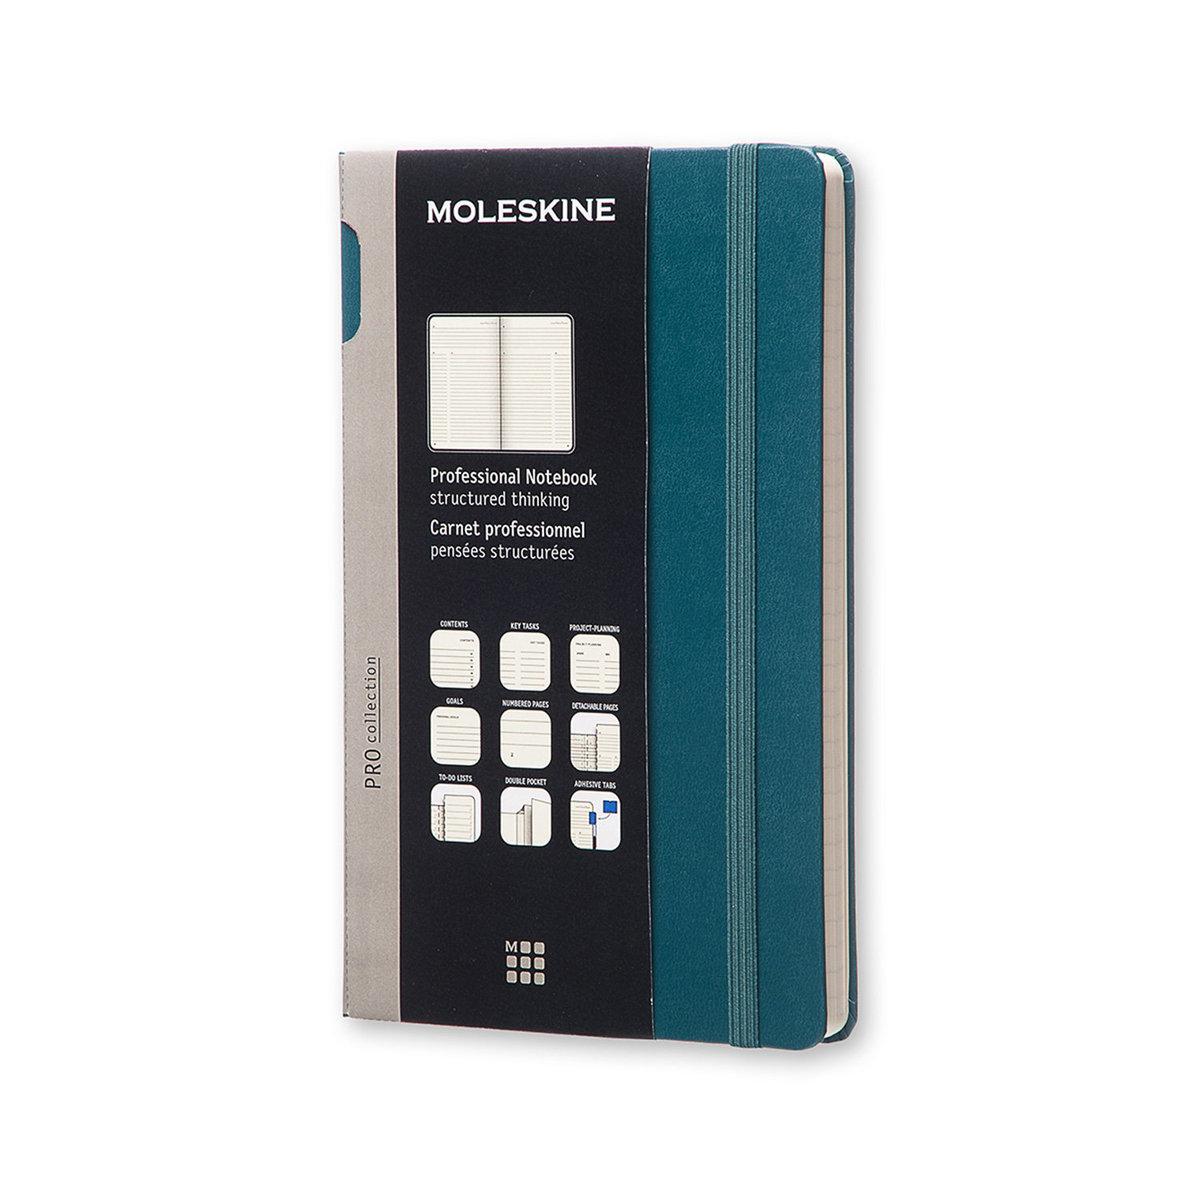 Moleskine PROFESSIONAL NOTEBOOK LARGE Tide Green HARD COVER